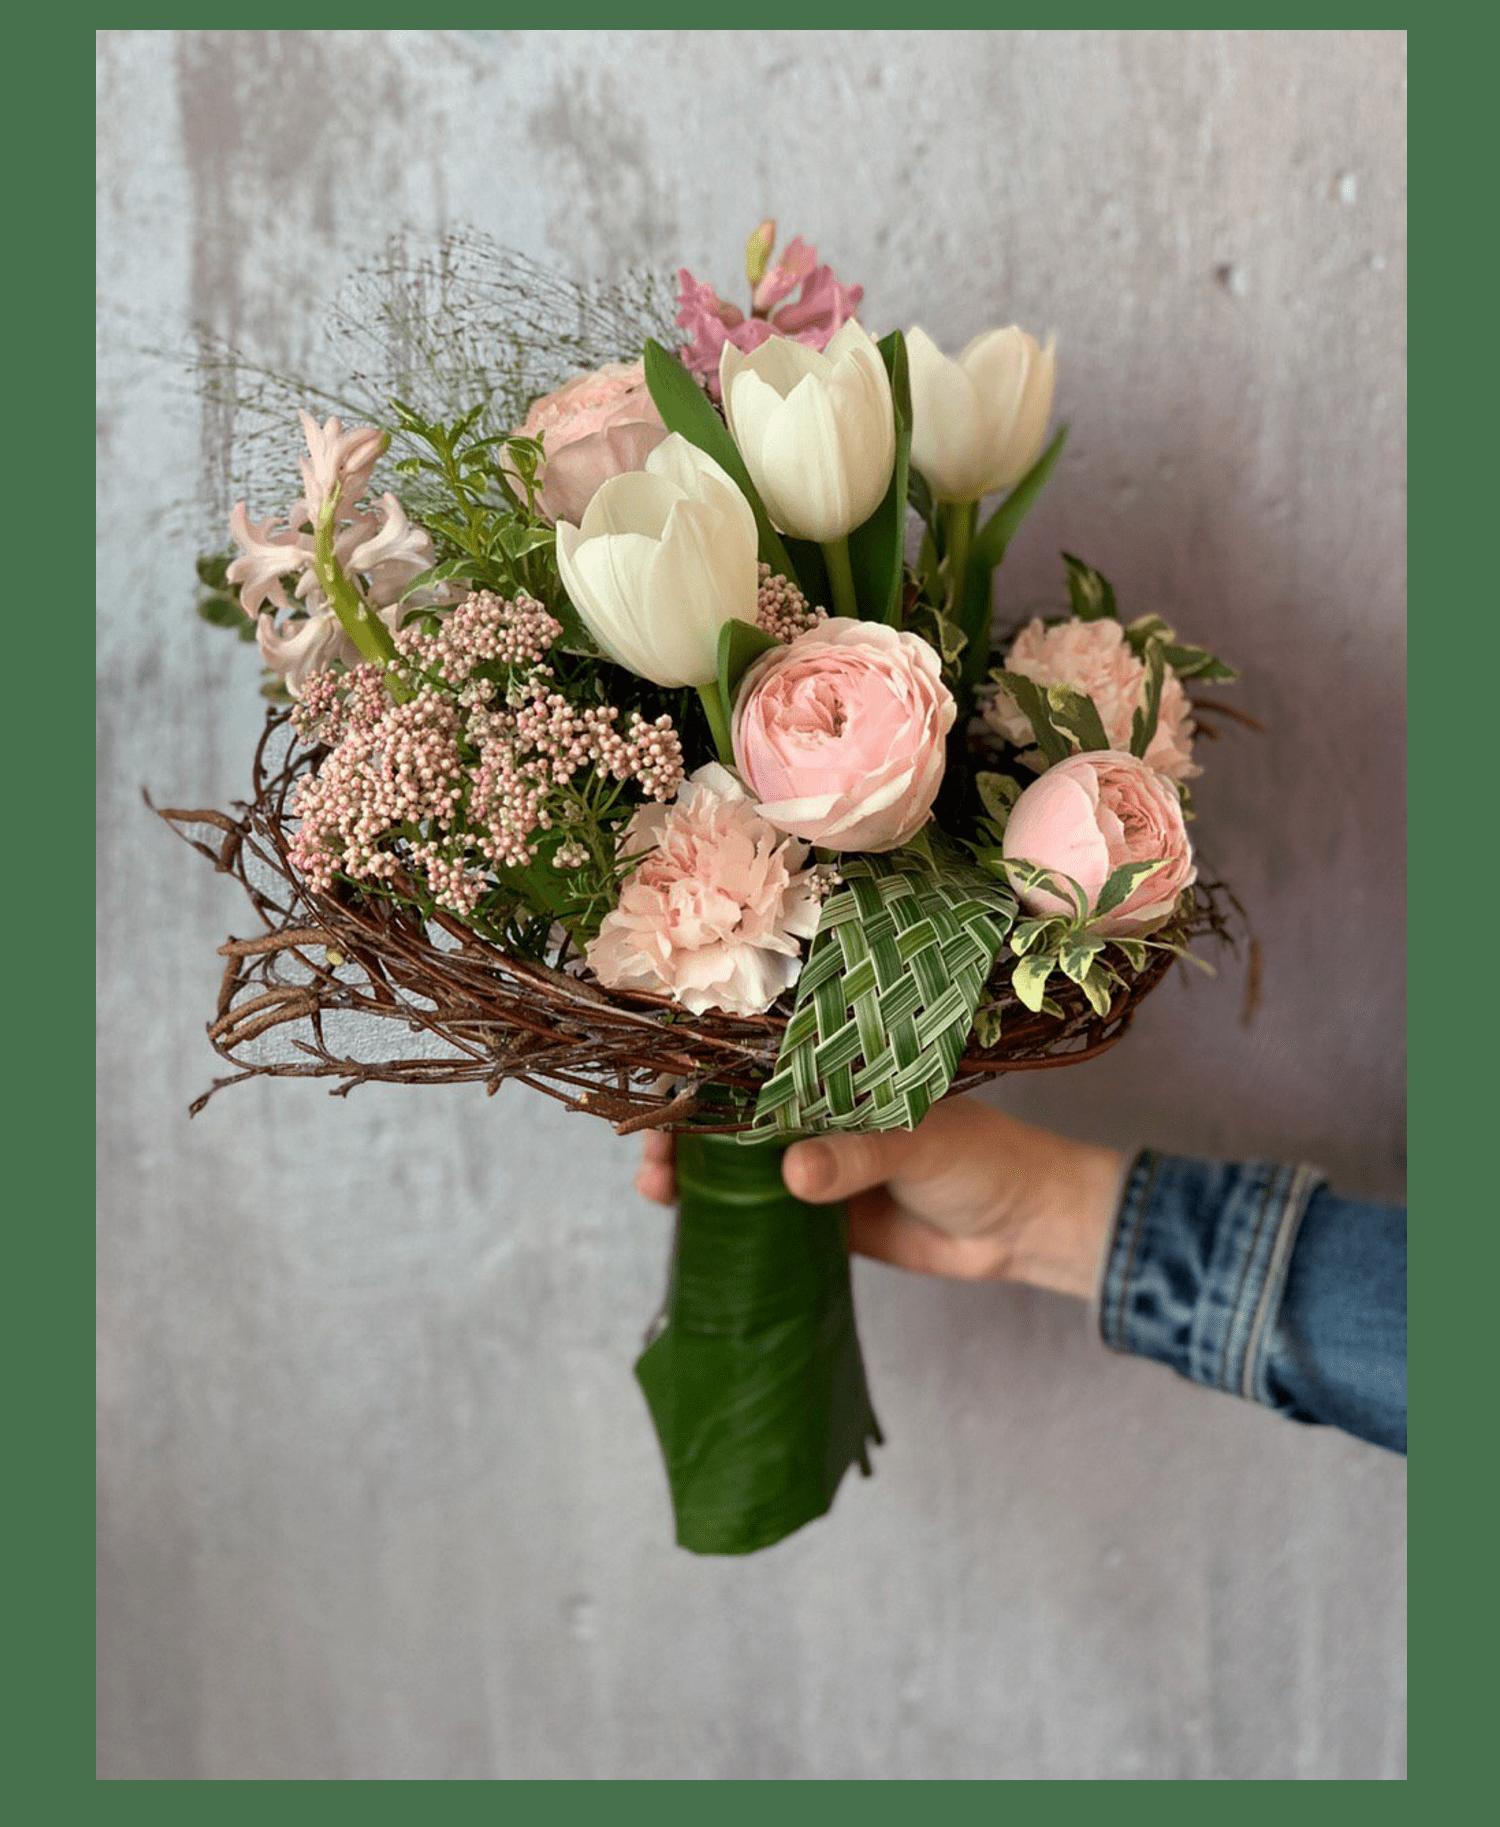 Букет на каркасе – Інтернет-магазин квітів STUDIO Flores